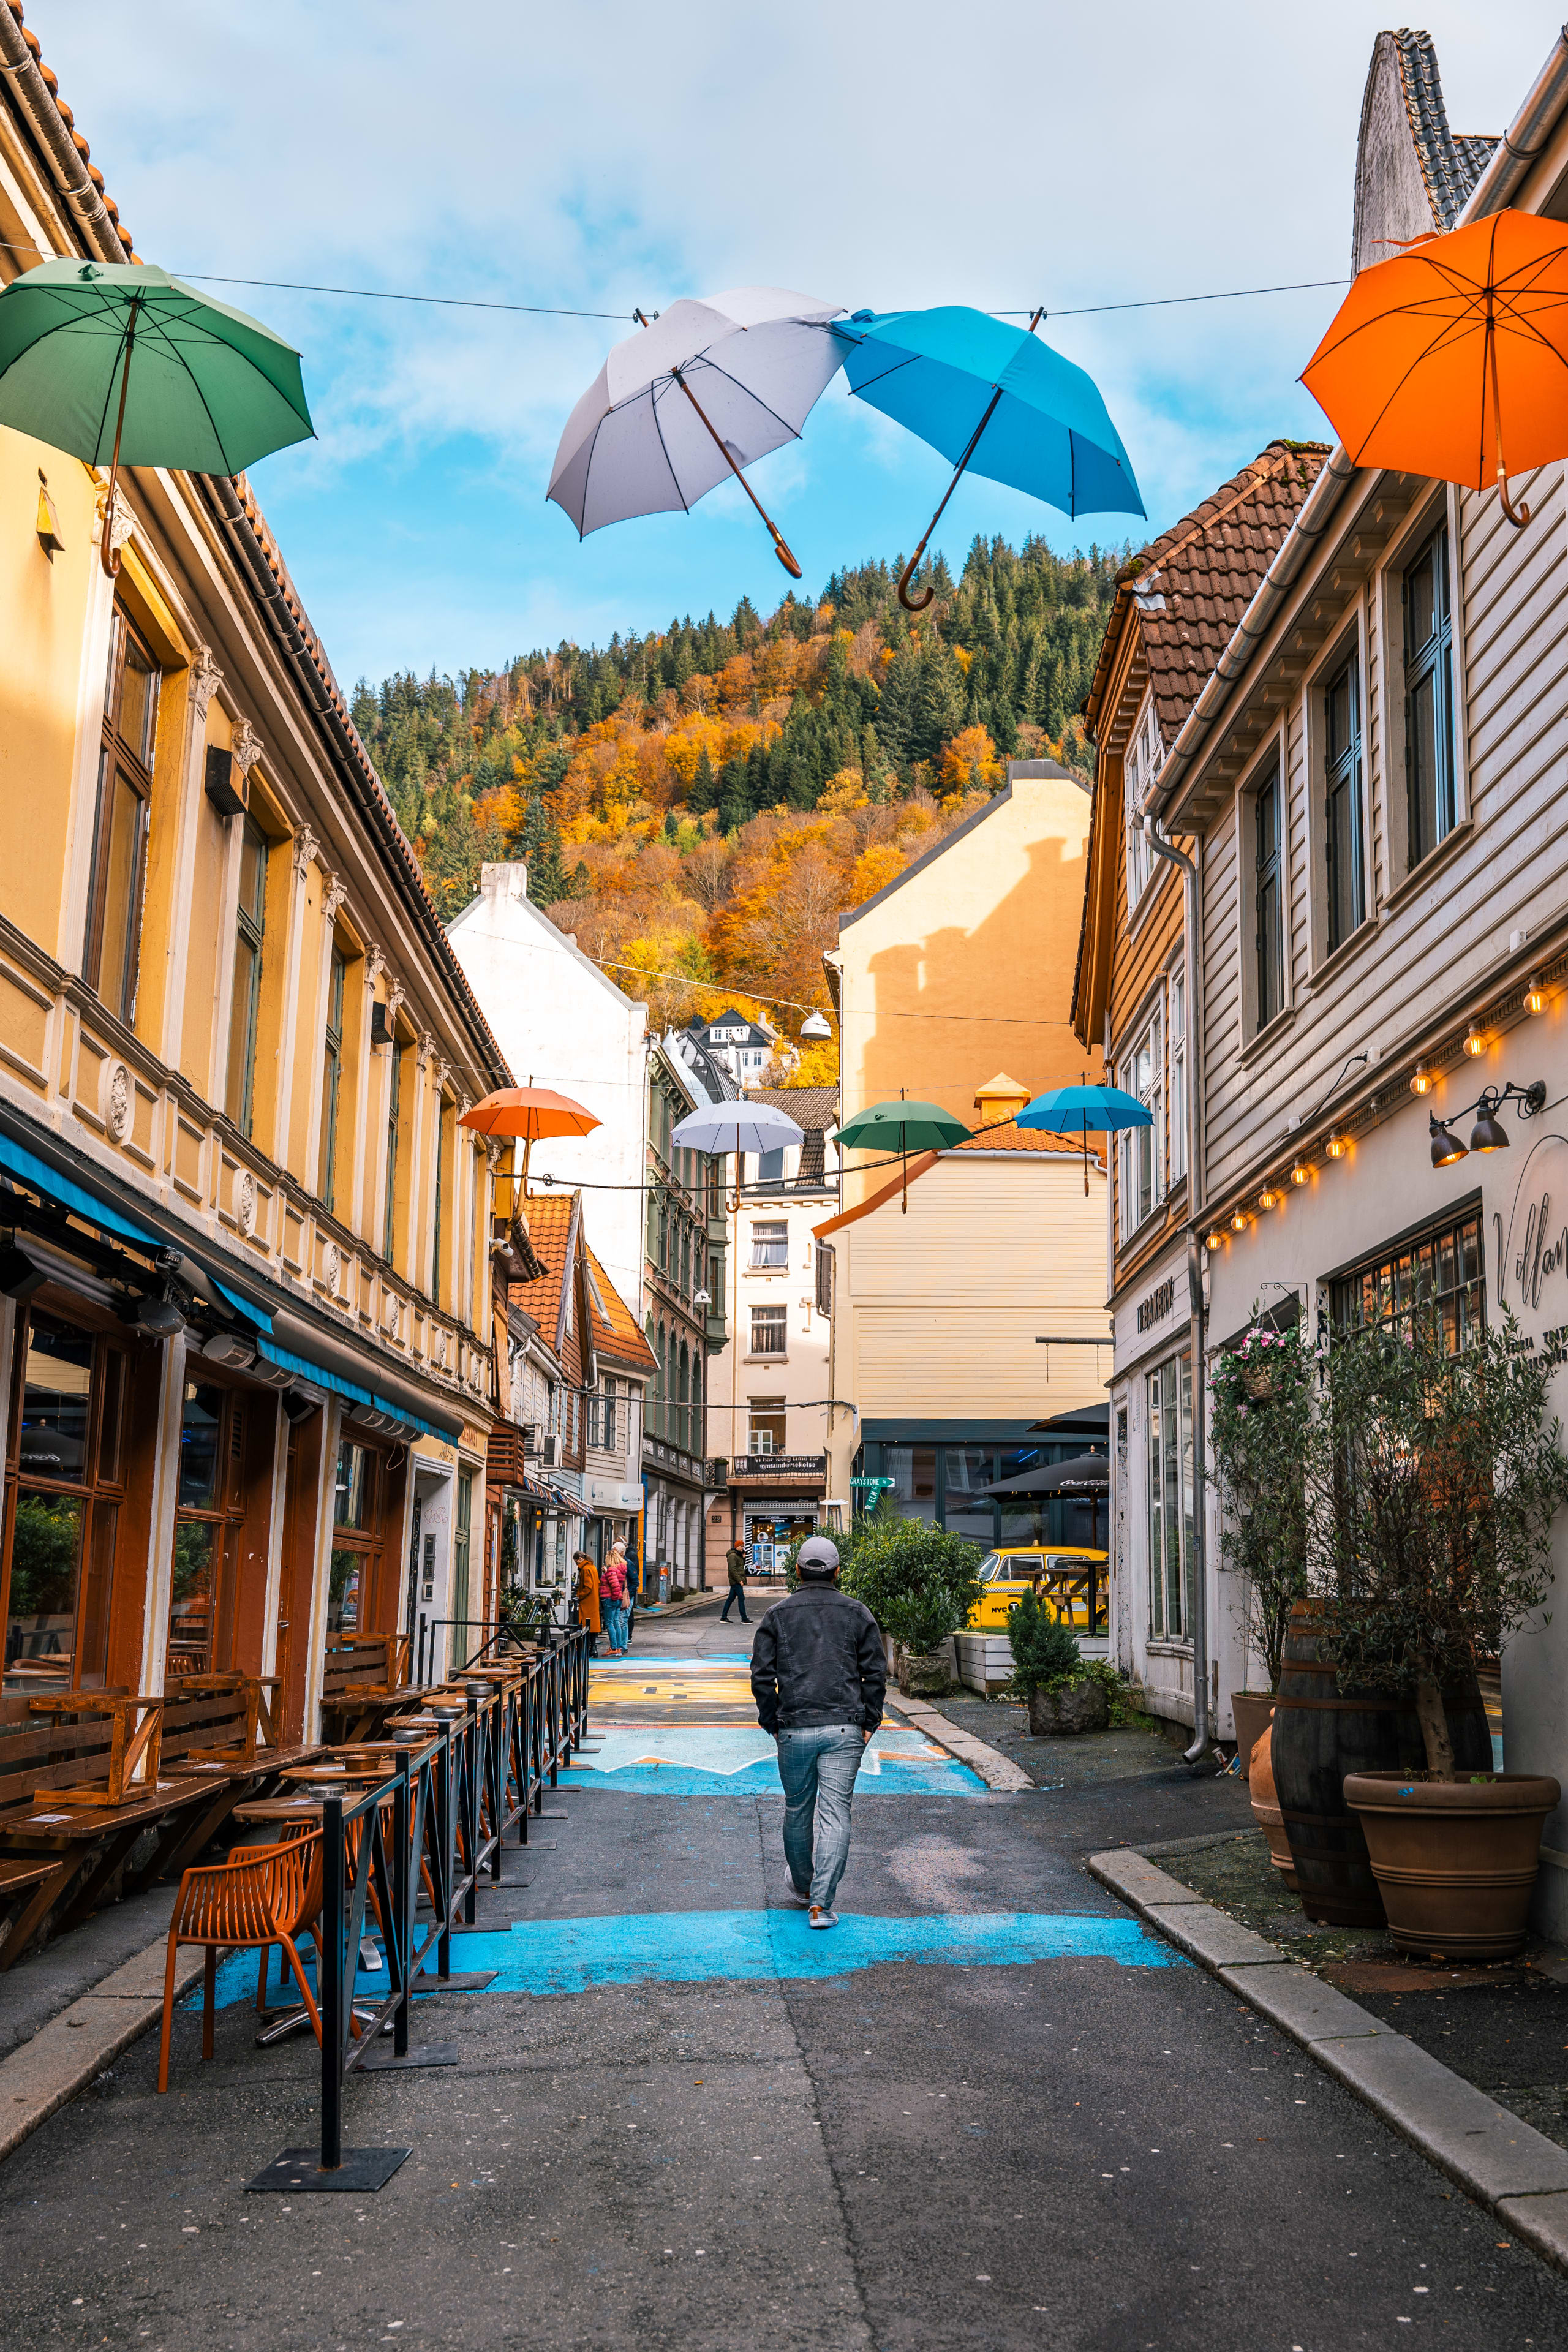 Skostredet vibrant street in Bergen